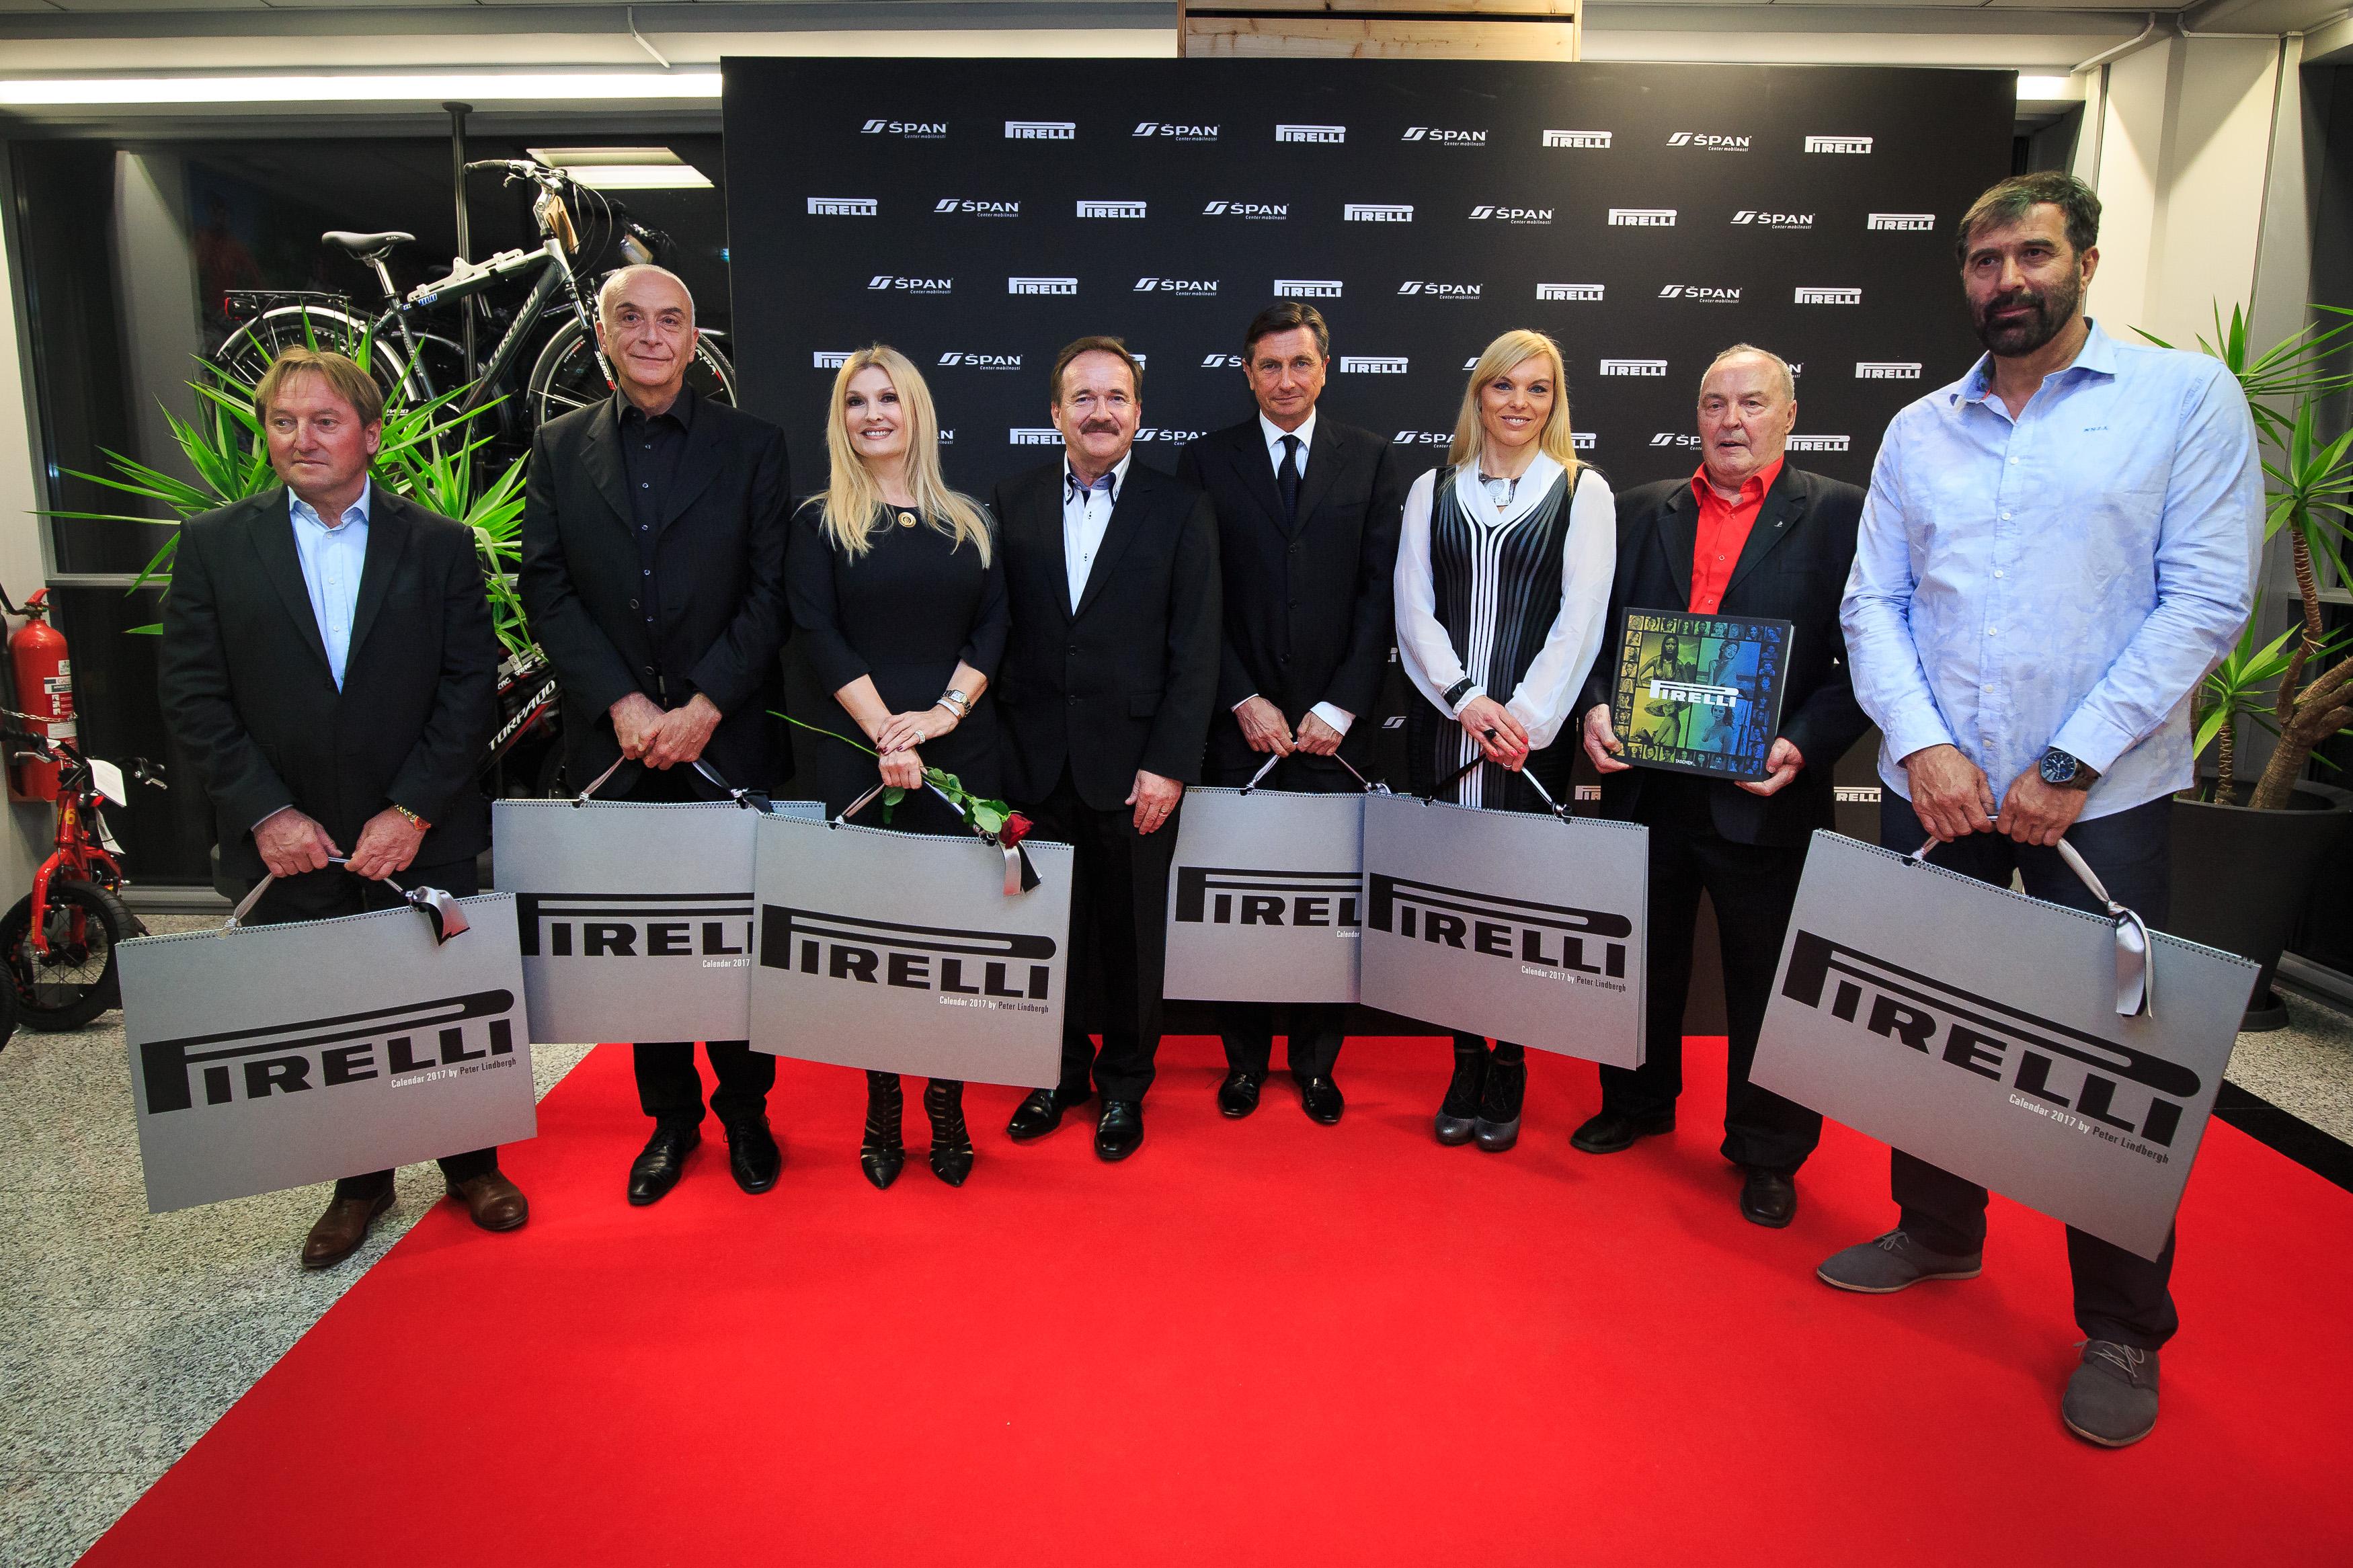 Koledar Pirelli 2017 je razkrit